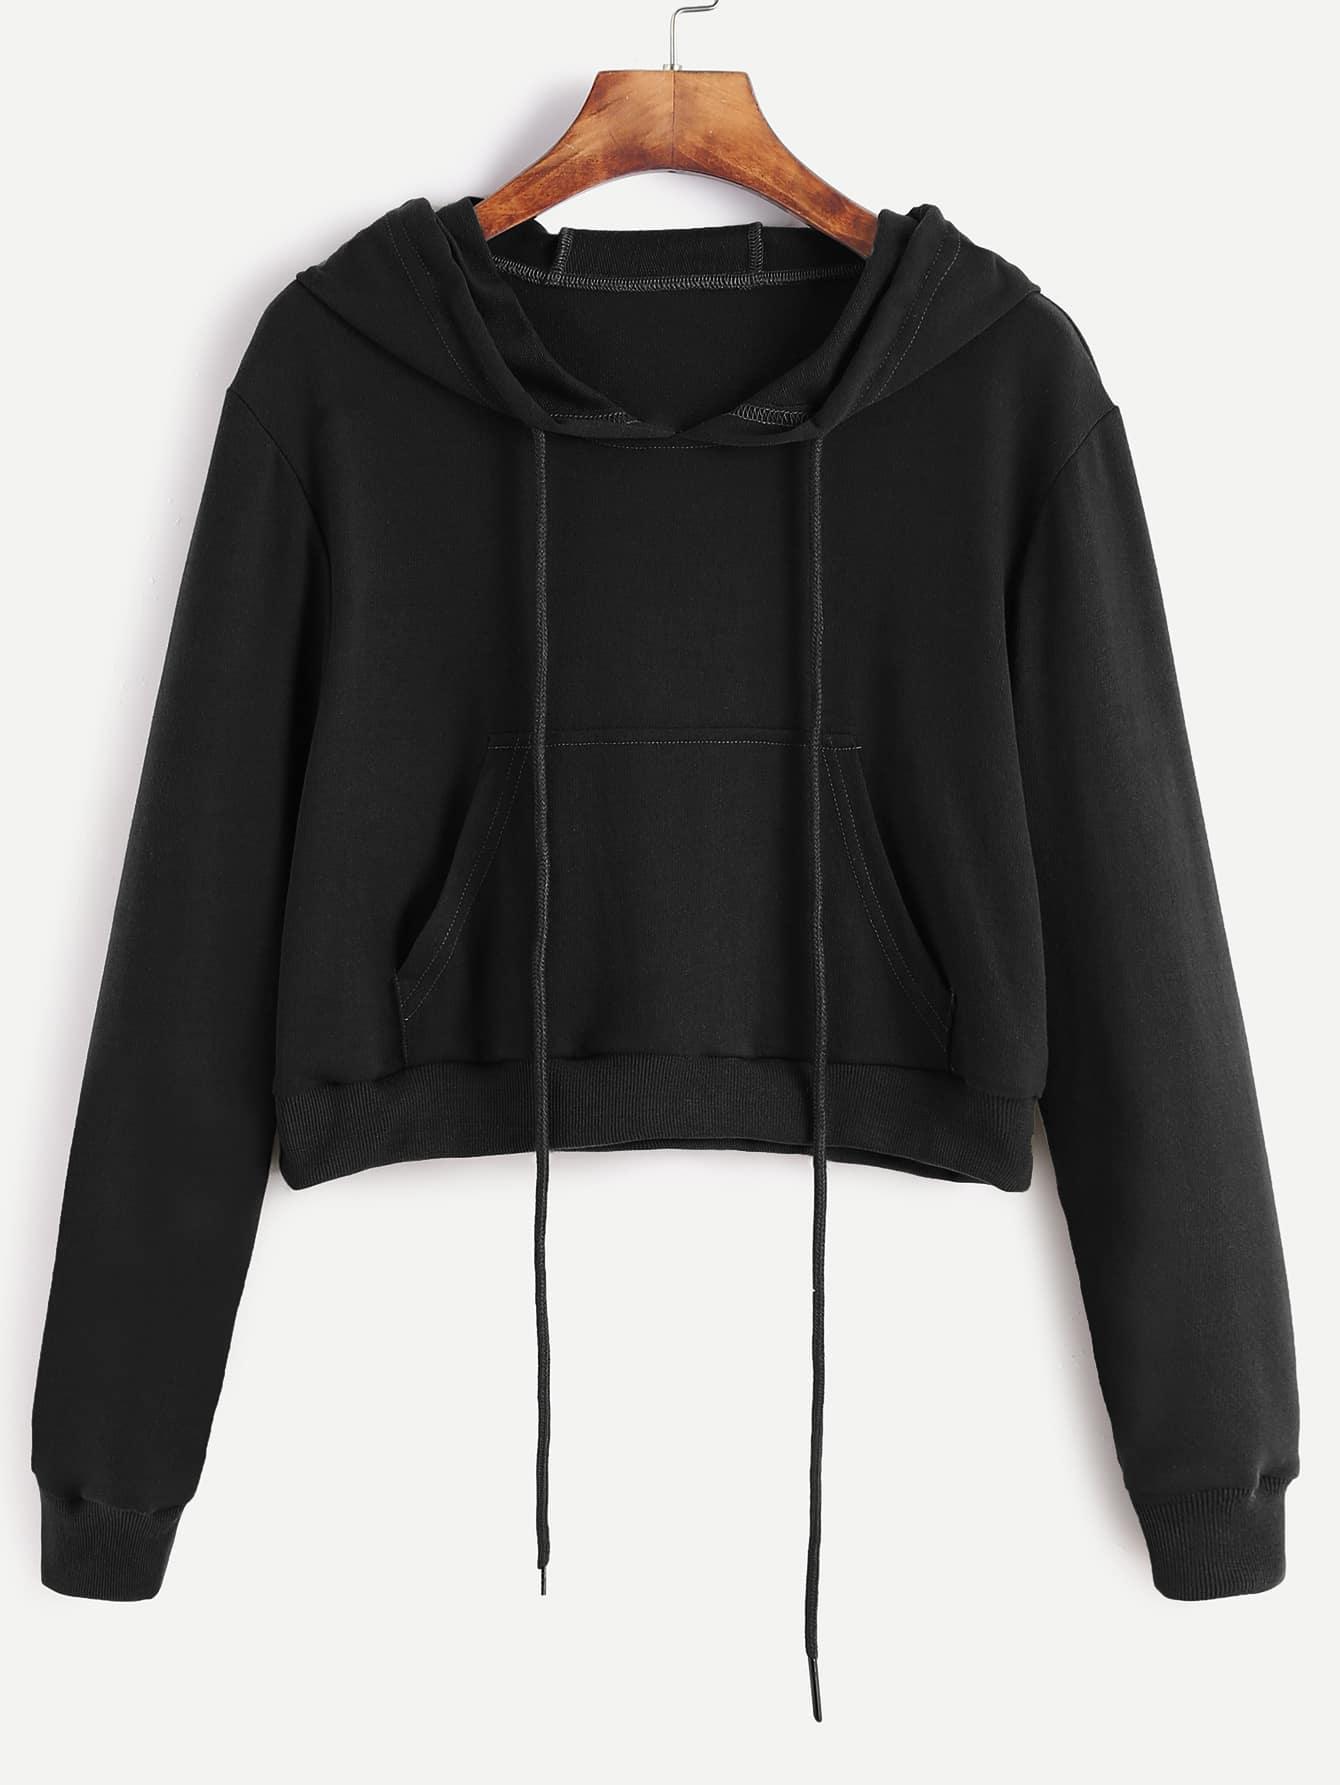 Black Drawstring Hooded Crop Sweatshirt With PocketFor ...